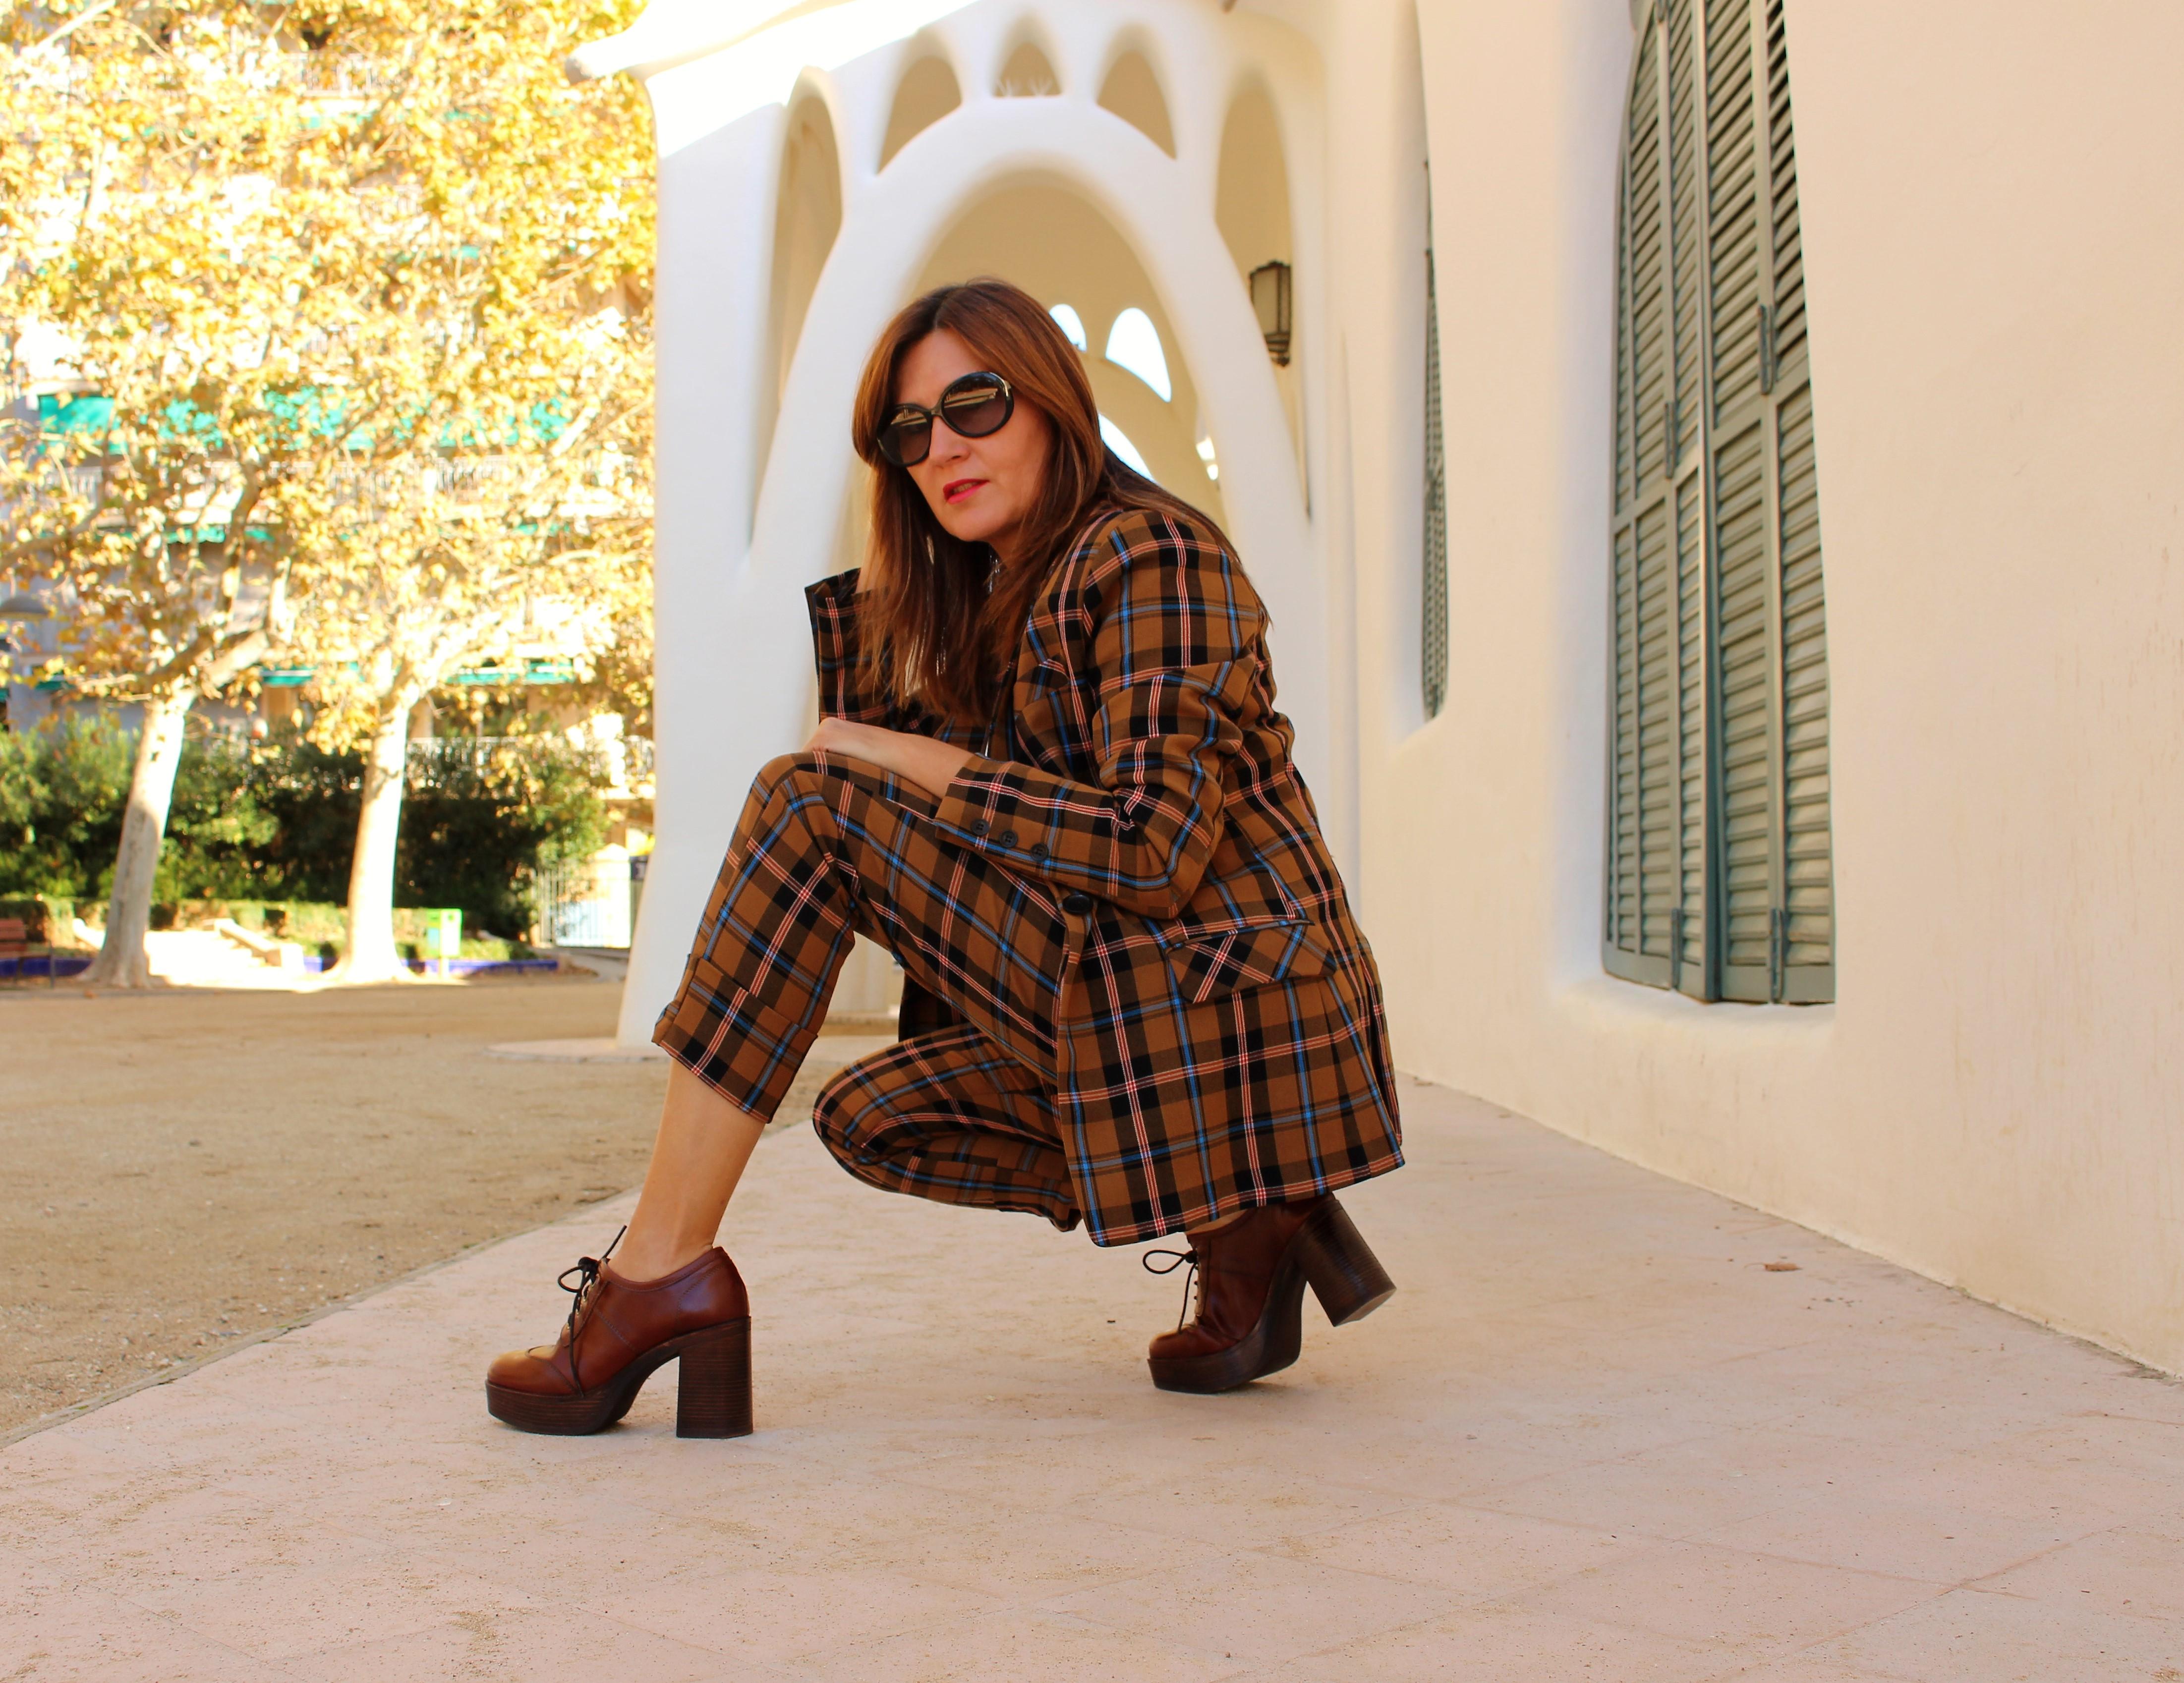 Cuidatuimagen, Traje retro by Bherska, zapatos Casas Club, Autumn Looks, Masia freixa 3